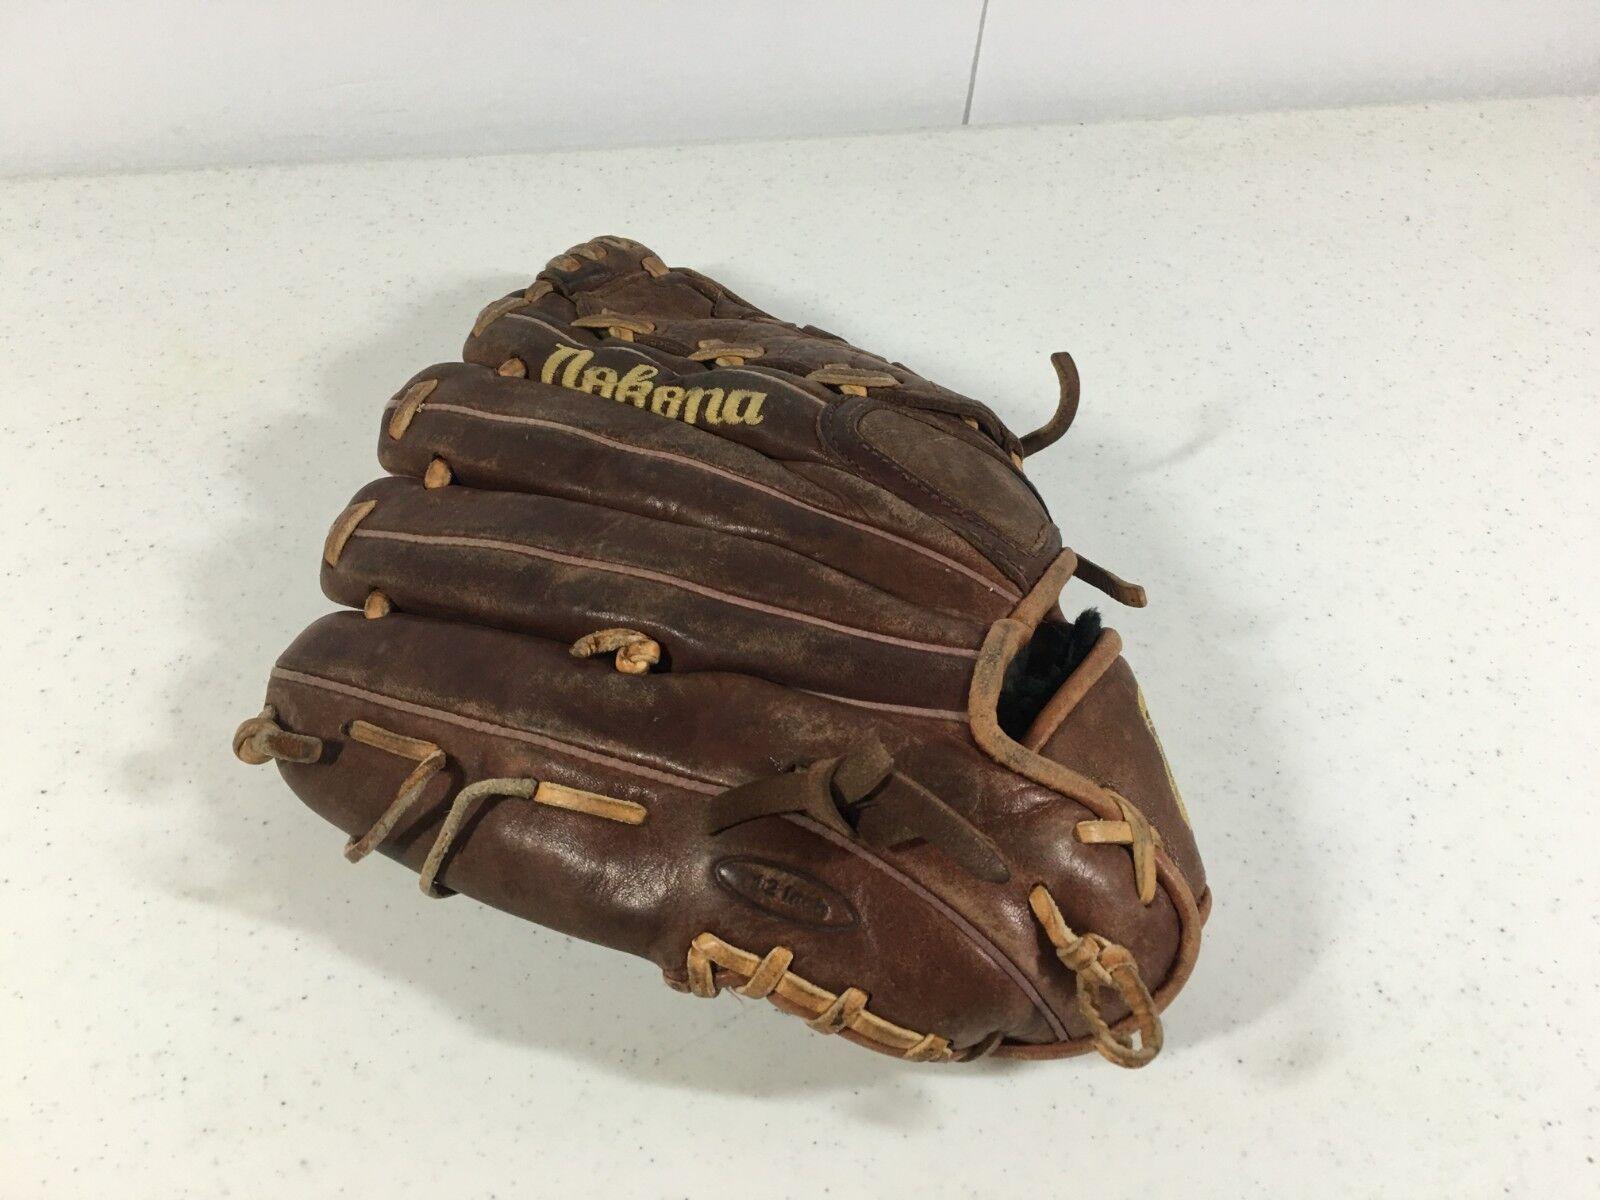 Nokona NOK 1200 Baseball Glove Mitt 12 12 Mitt inch Pro Hide Handcrafted Series Cowhide 936094